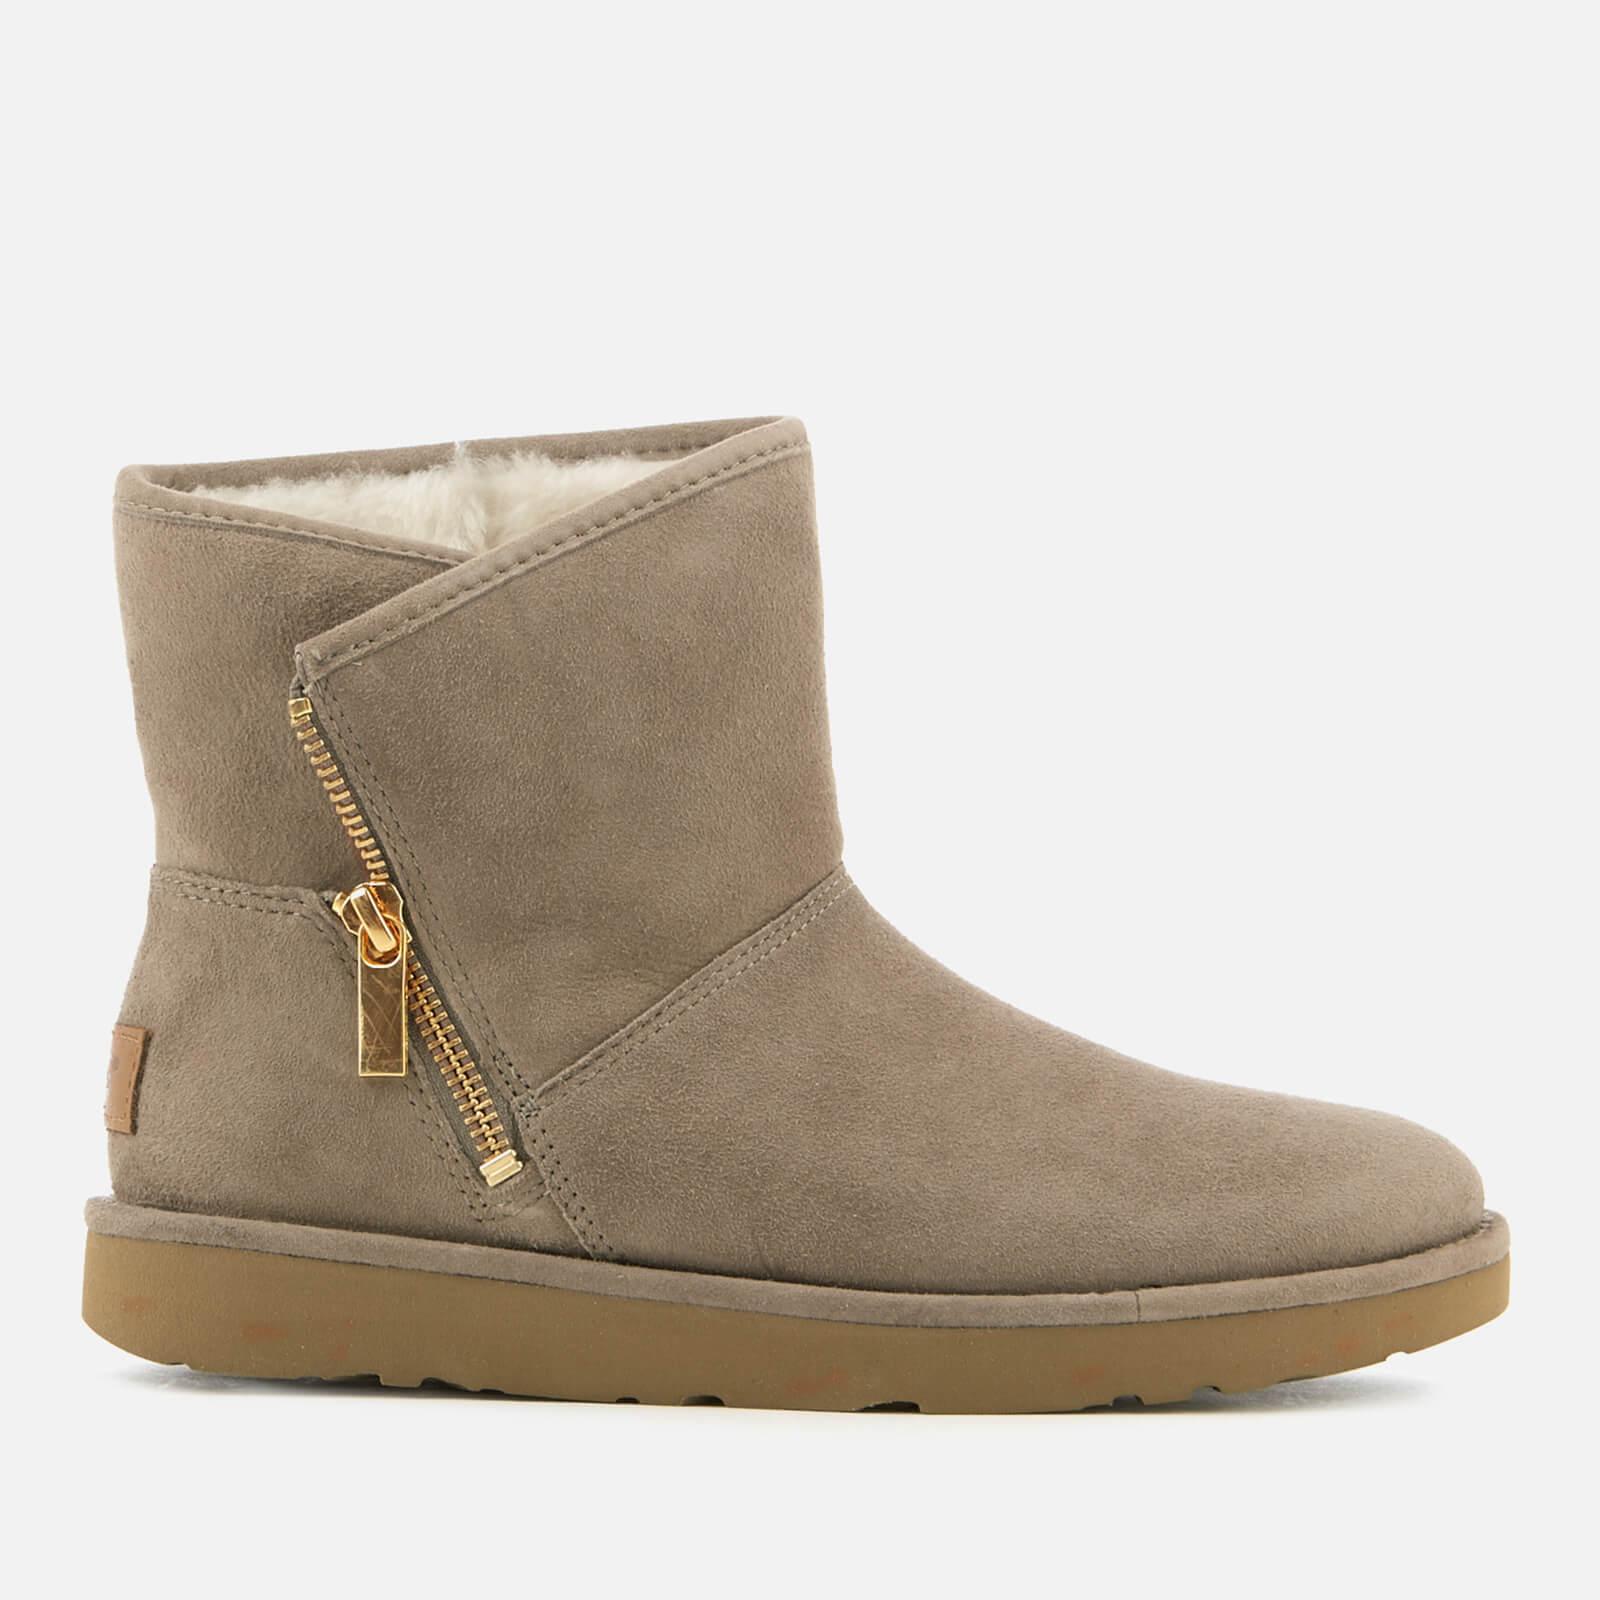 b96f0158b89 UGG Women's Kip Suede Zip Side Boots - Clay